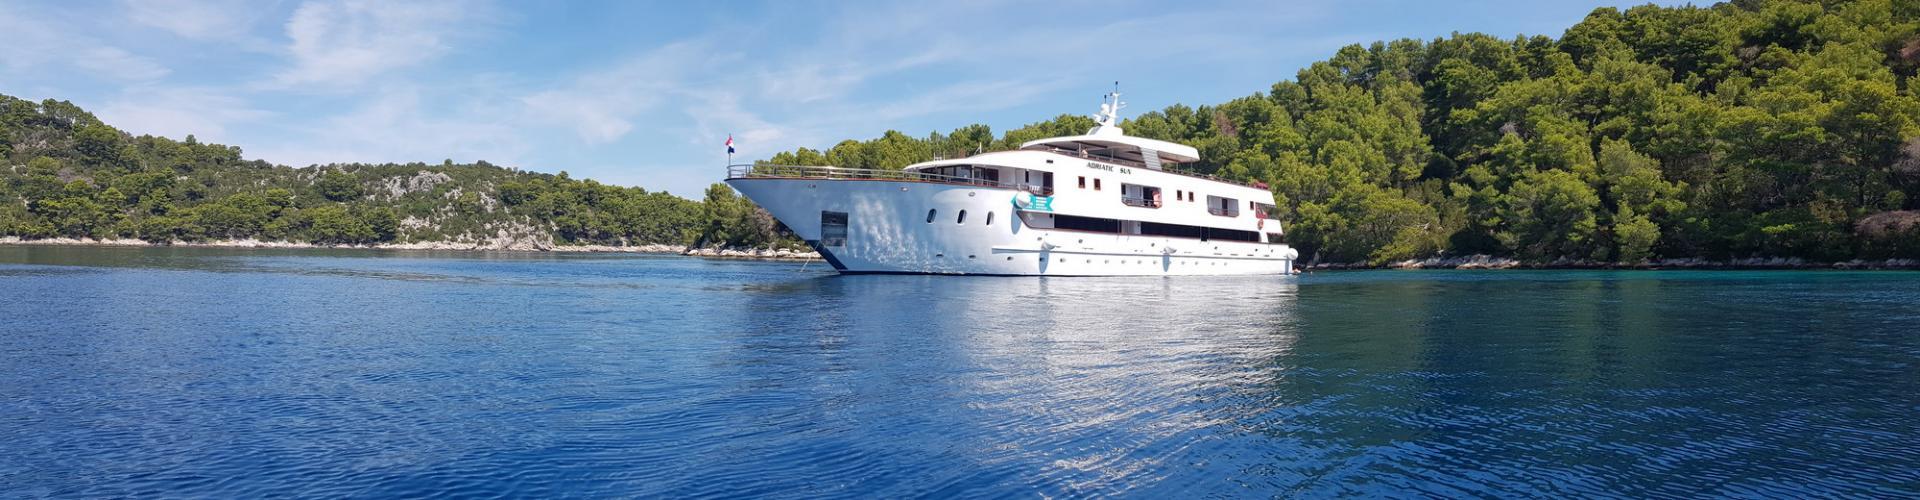 motor boat Deluxe Superior cruiser MV Adriatic Sun